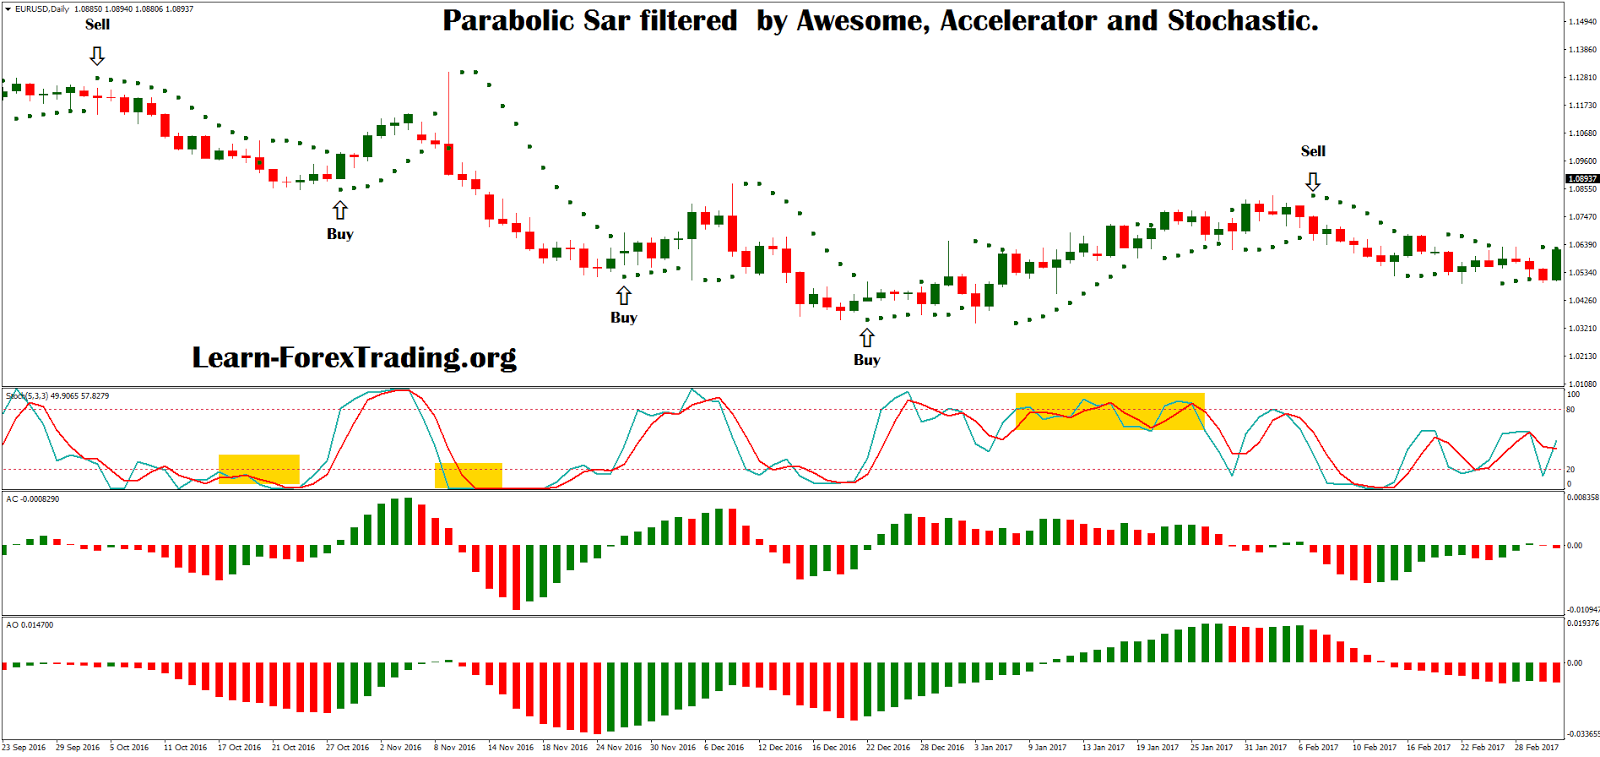 Strategy forex parabolic sar + stochastic